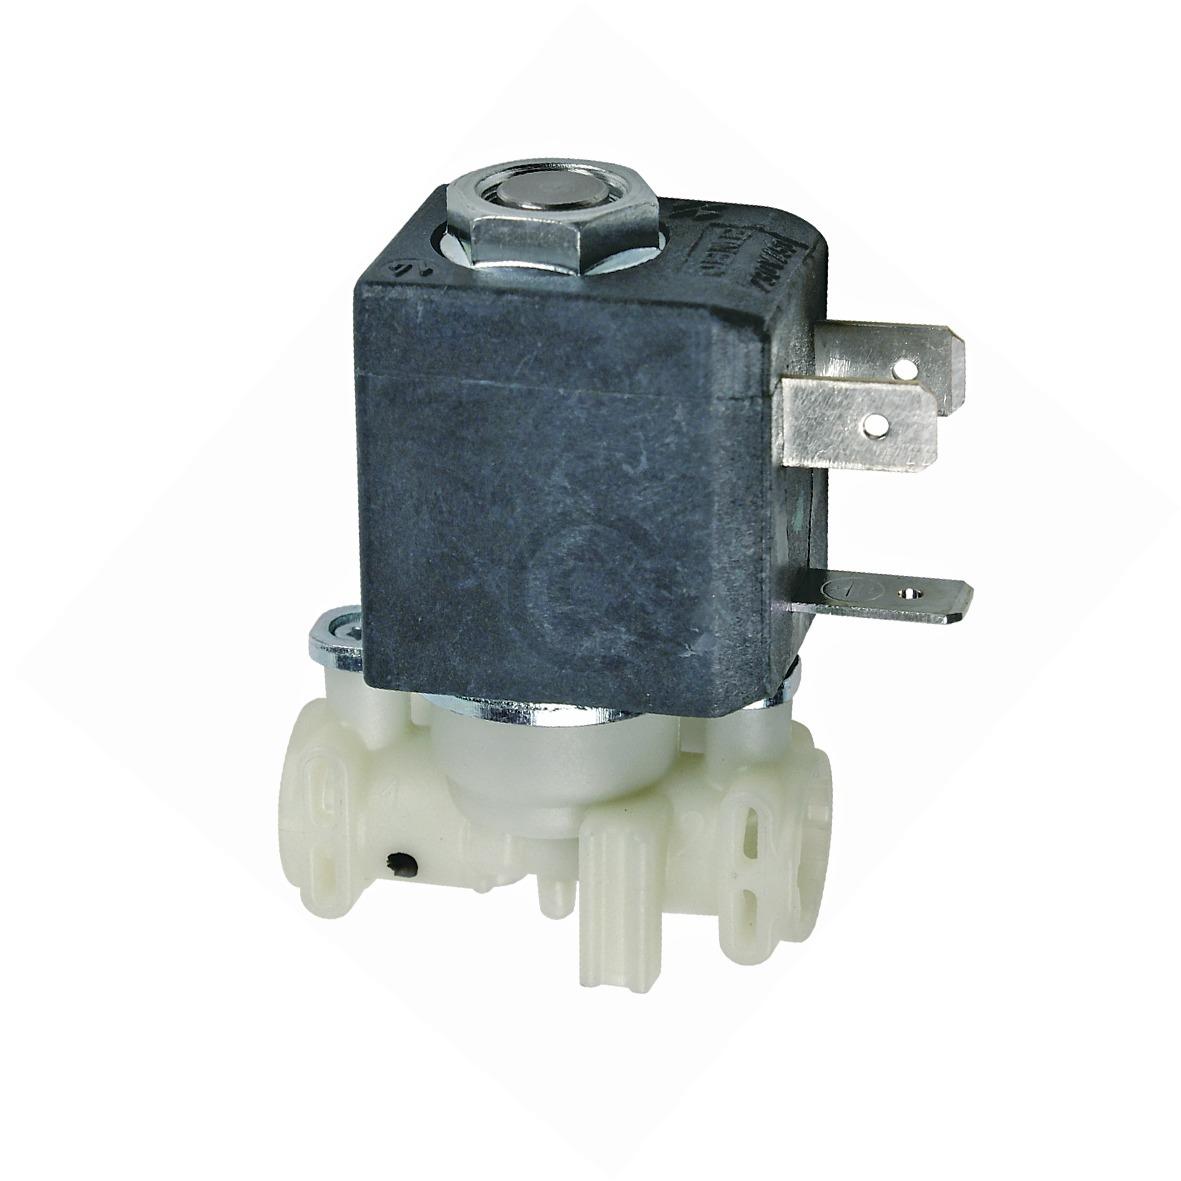 Ventil Magnetventil mit zwei Abgängen 5213218321 DeLonghi